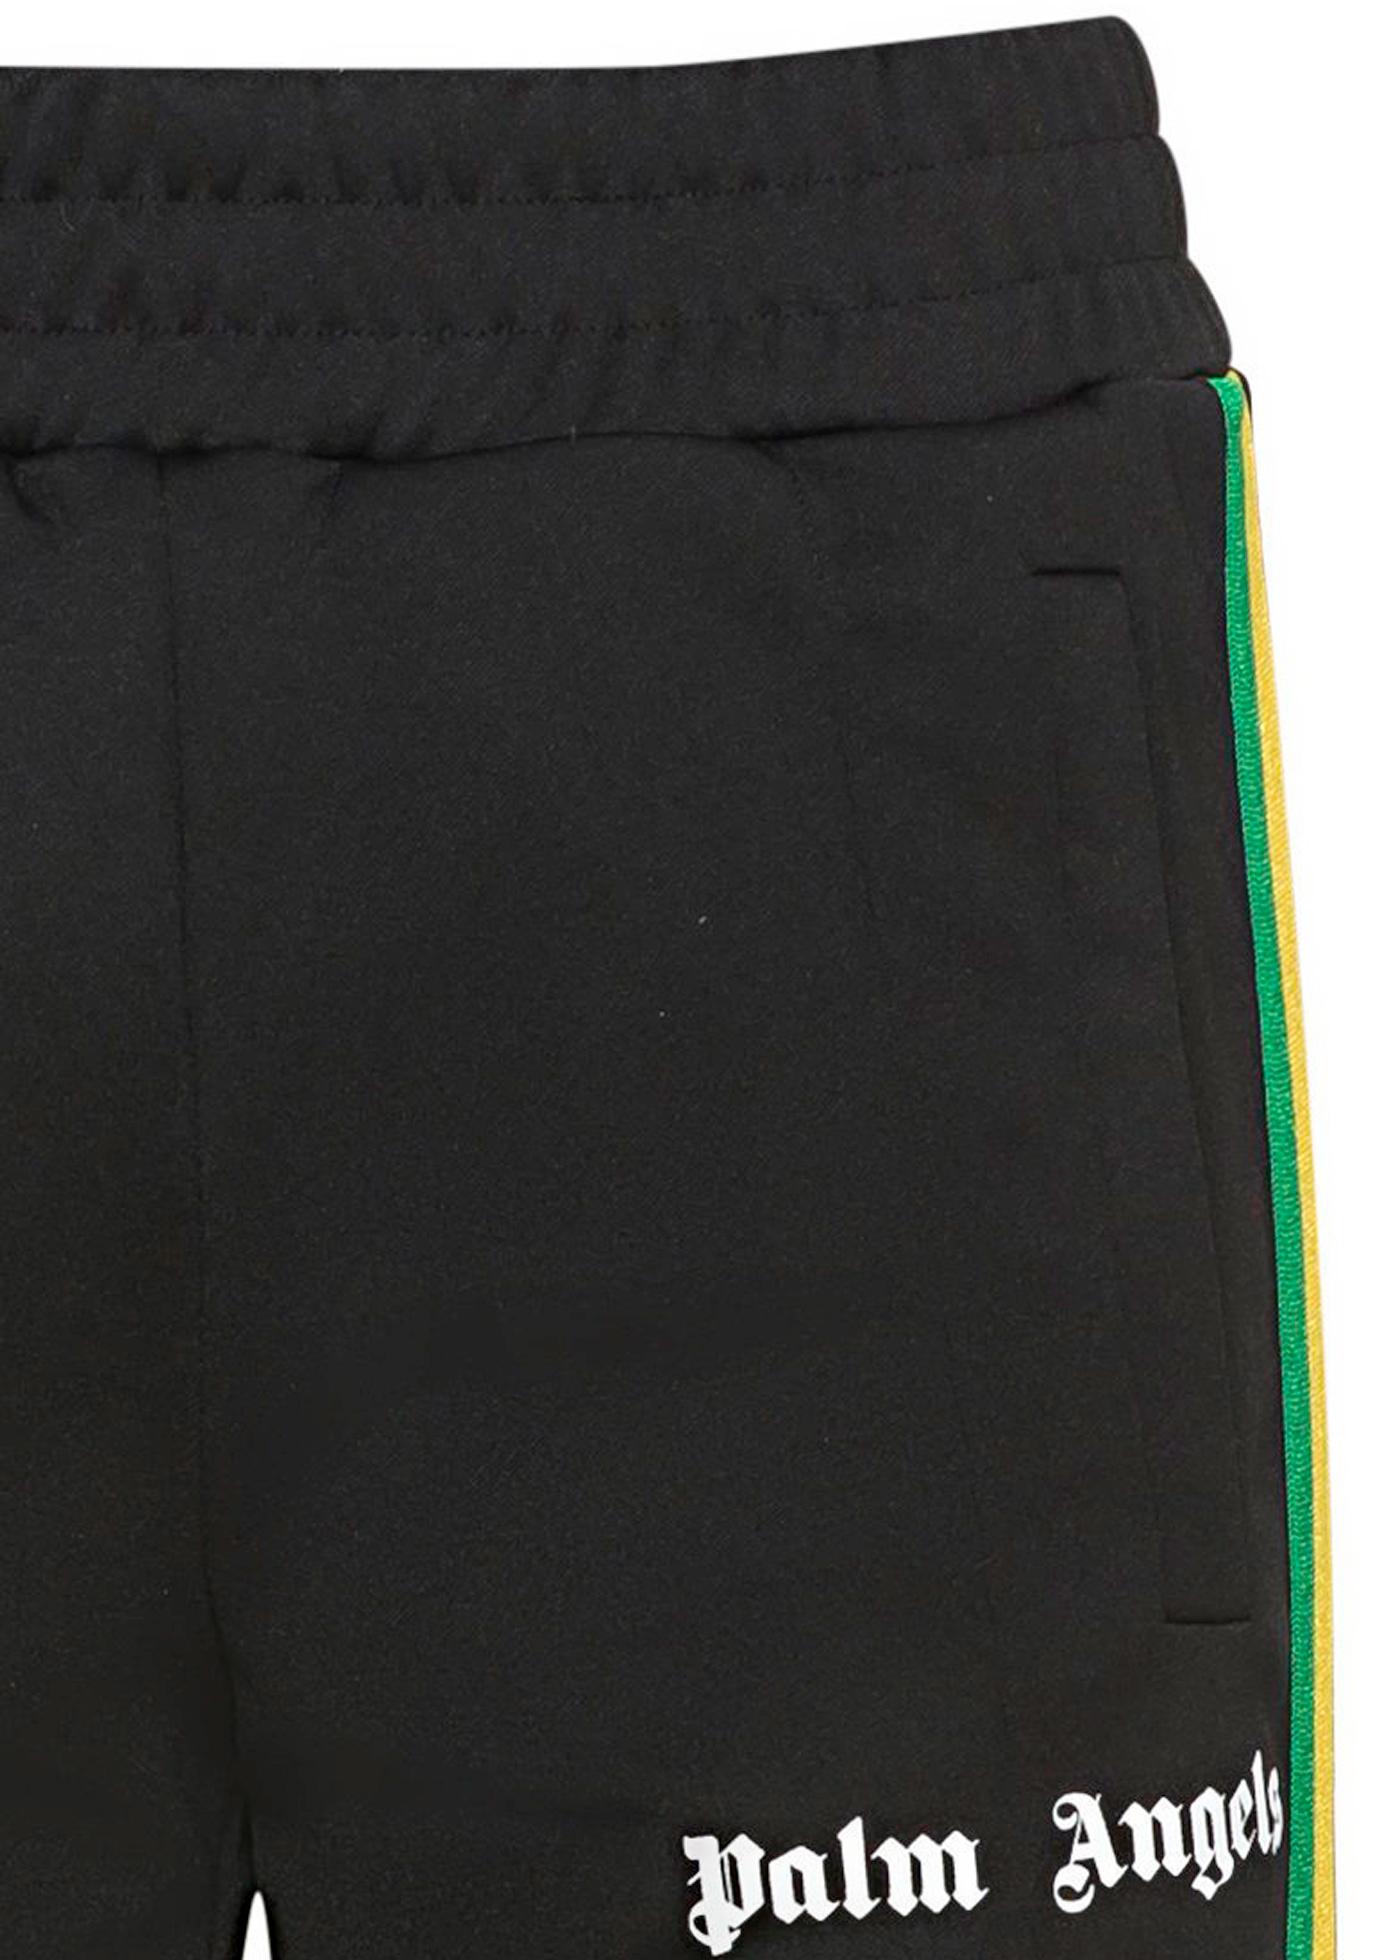 EXODUS CLASSIC TRACK PANTS image number 2